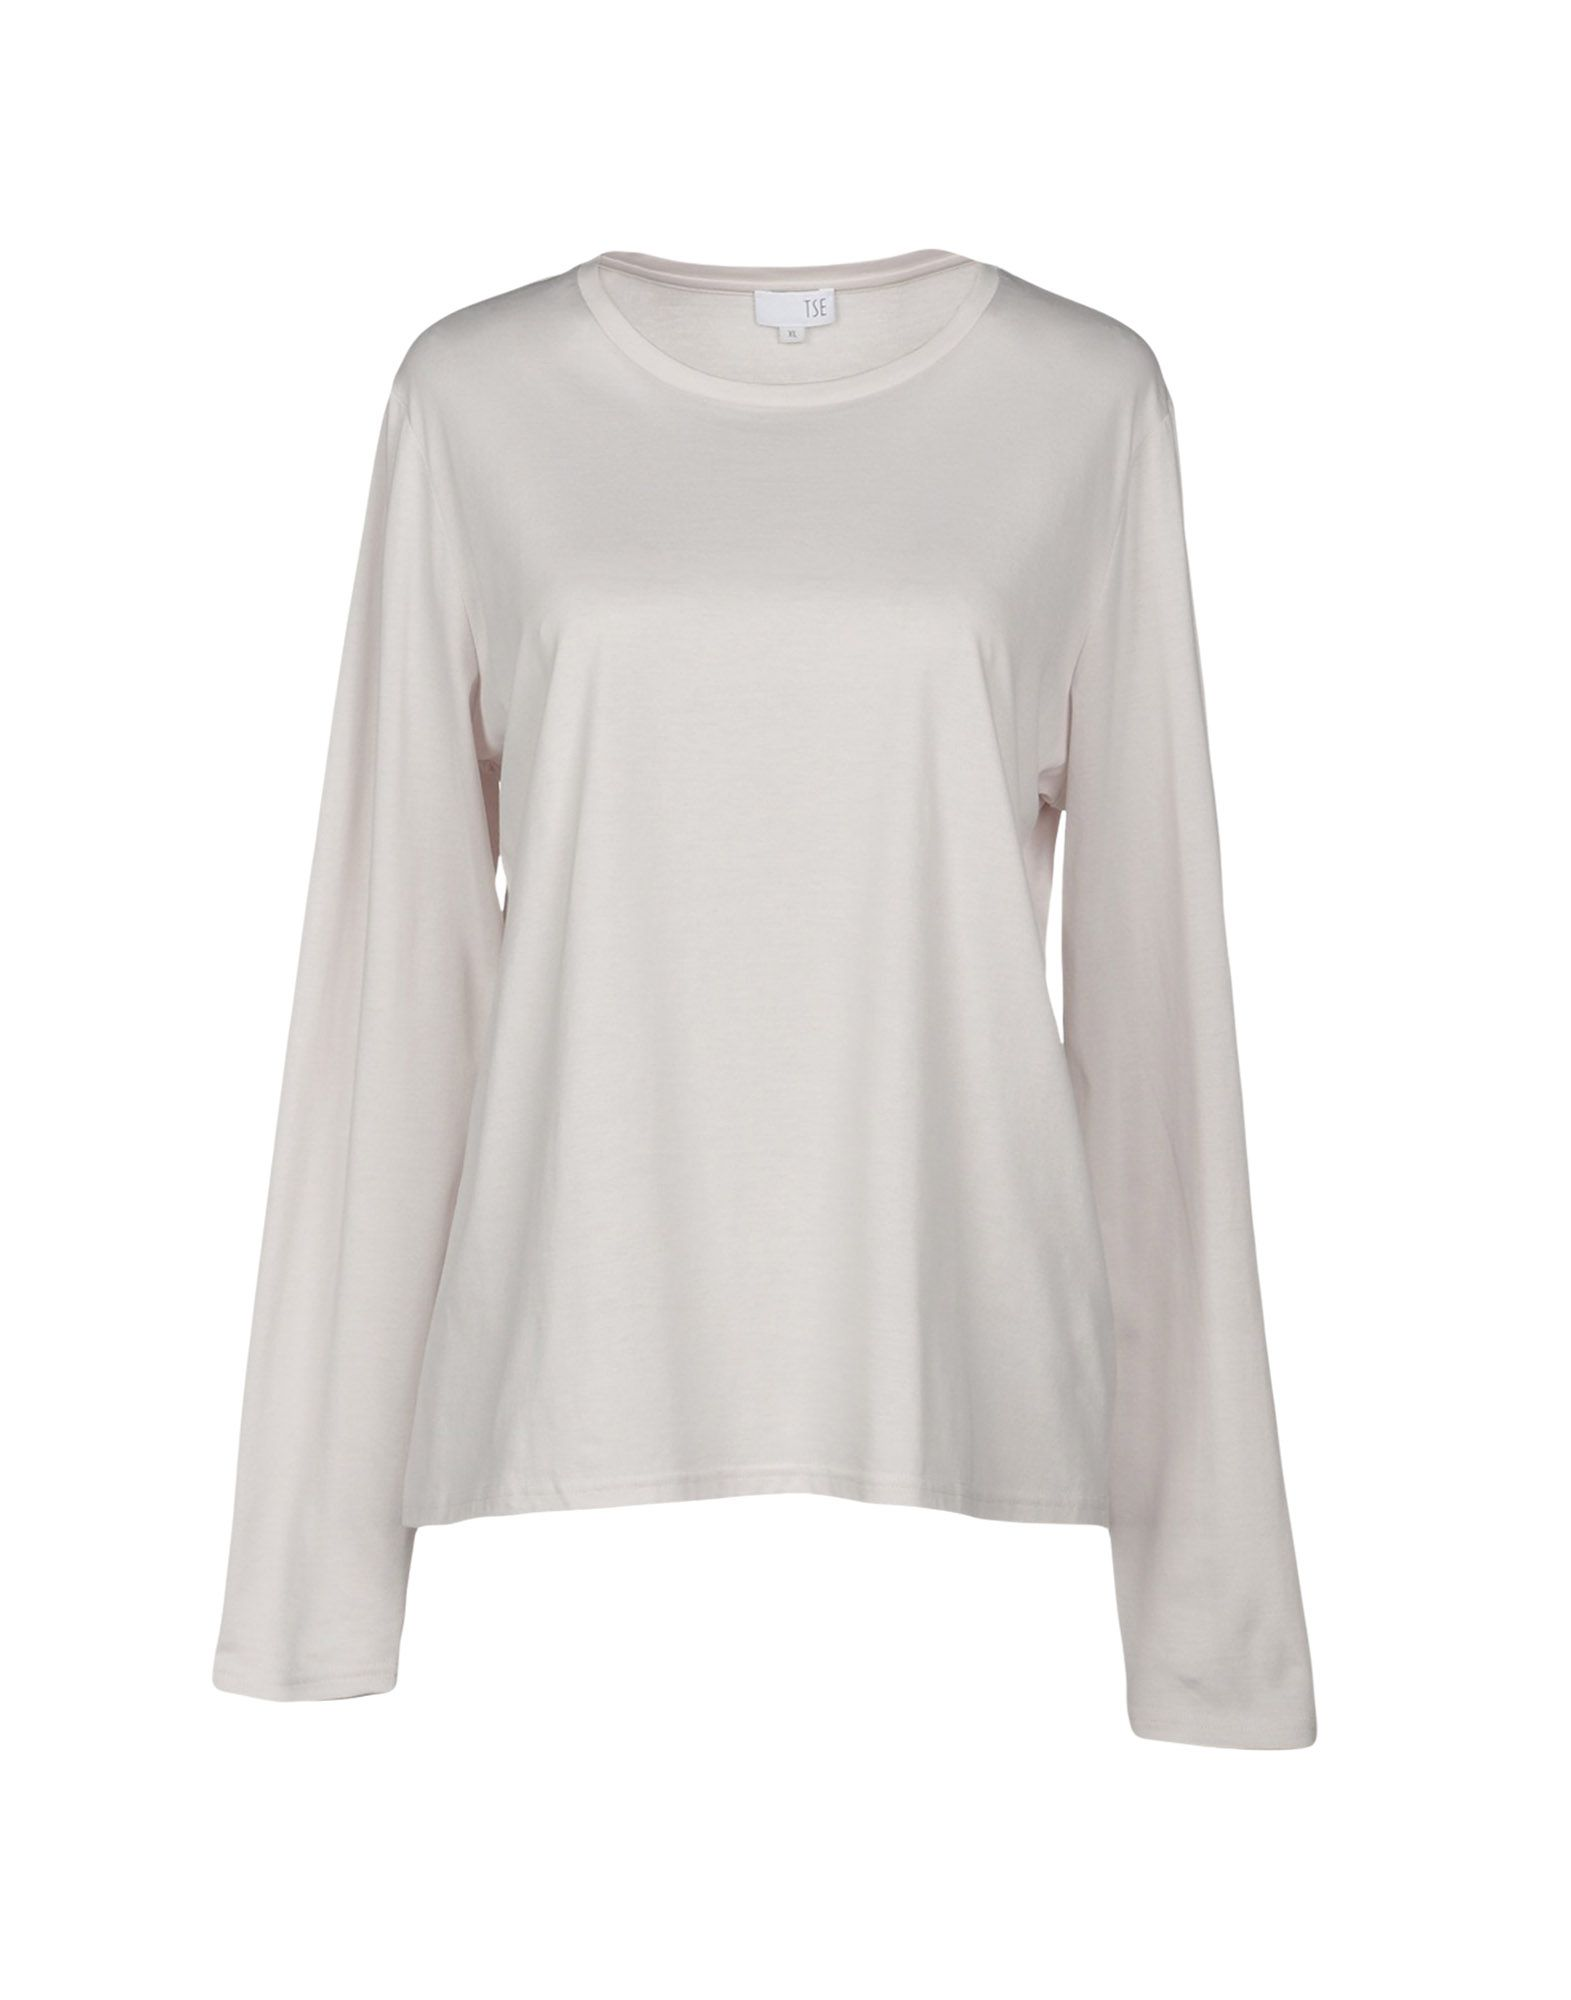 TSE T-Shirt in Light Grey